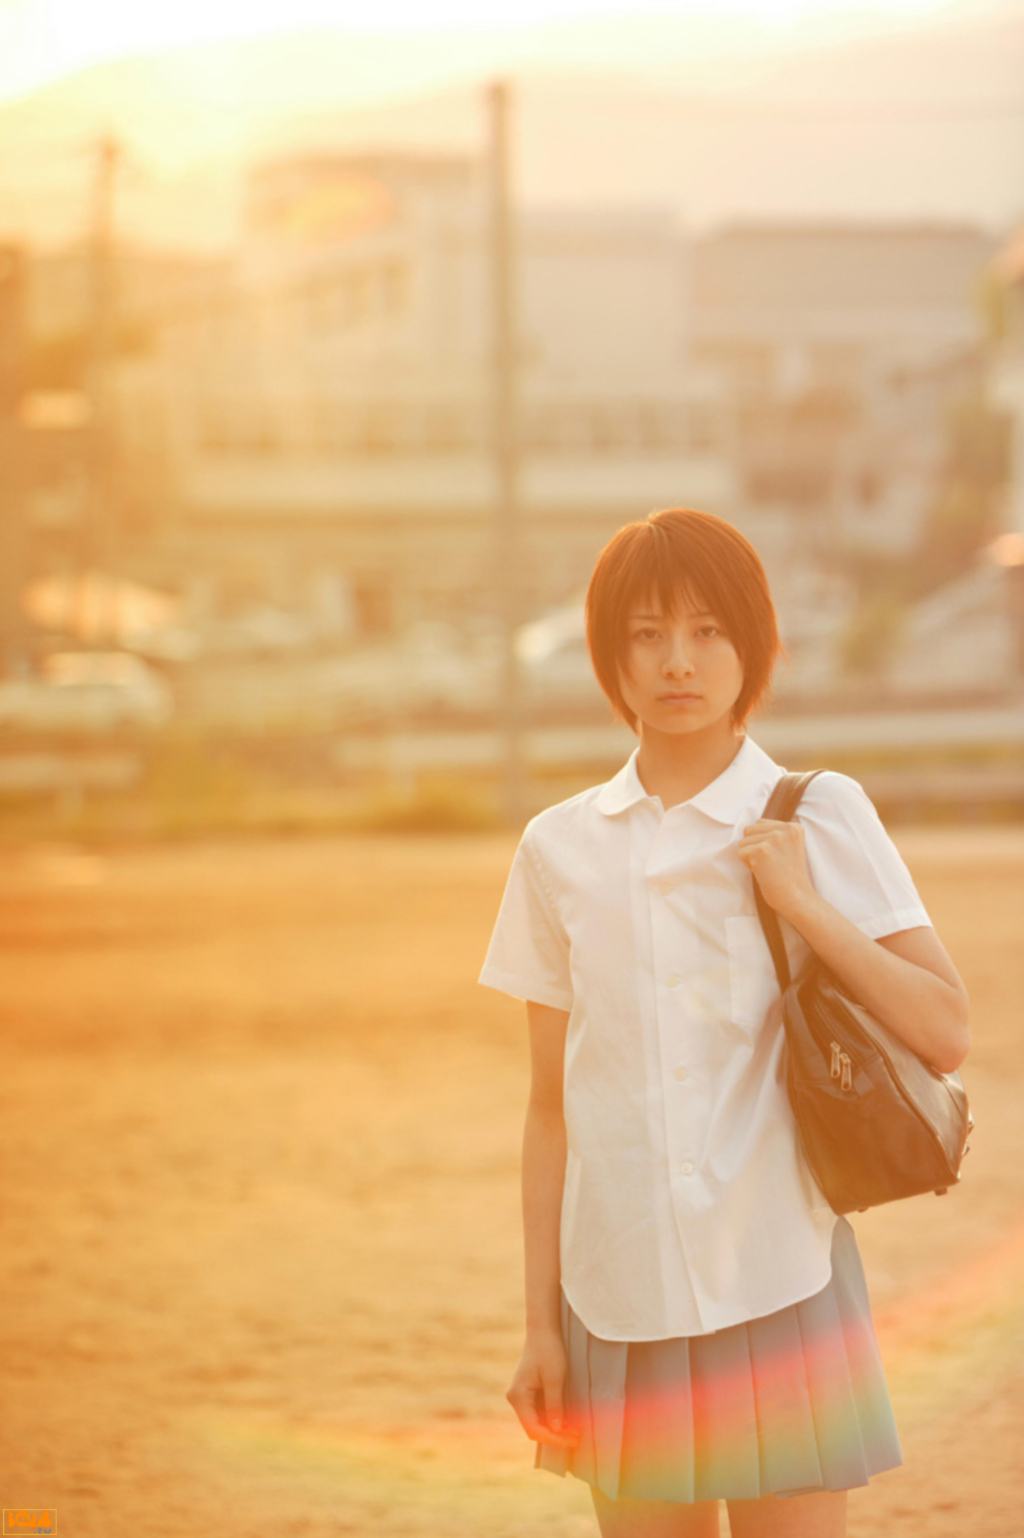 Chihiro Otsuka (大塚ちひろ Ōtsuka Chihiro, born March 12, 1986 ...